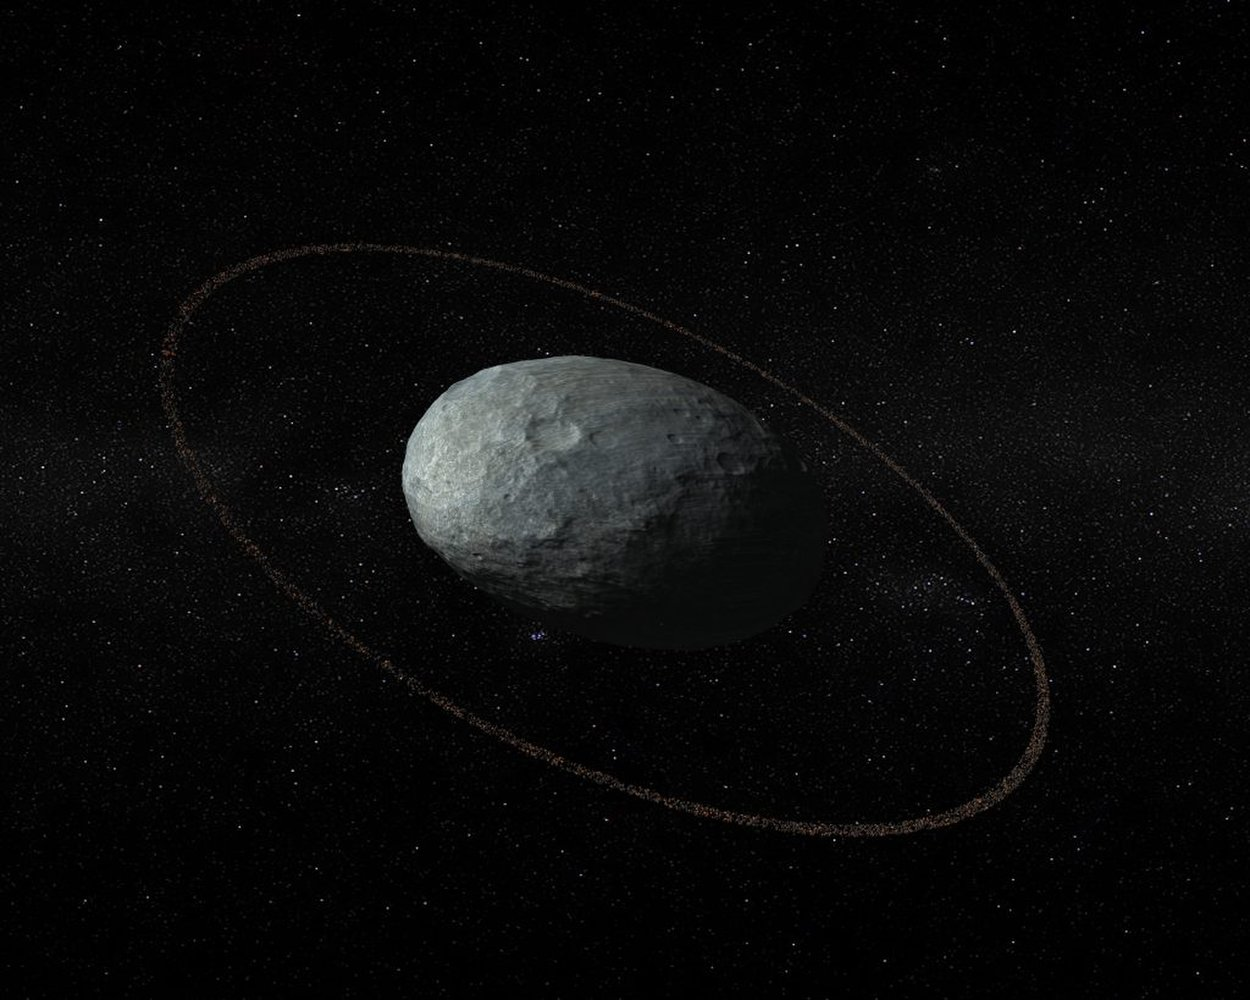 Surprise! Bizarre Dwarf Planet Haumea Has Rings https://t.co/VOGbry9Q0J https://t.co/O8eqHOChhQ